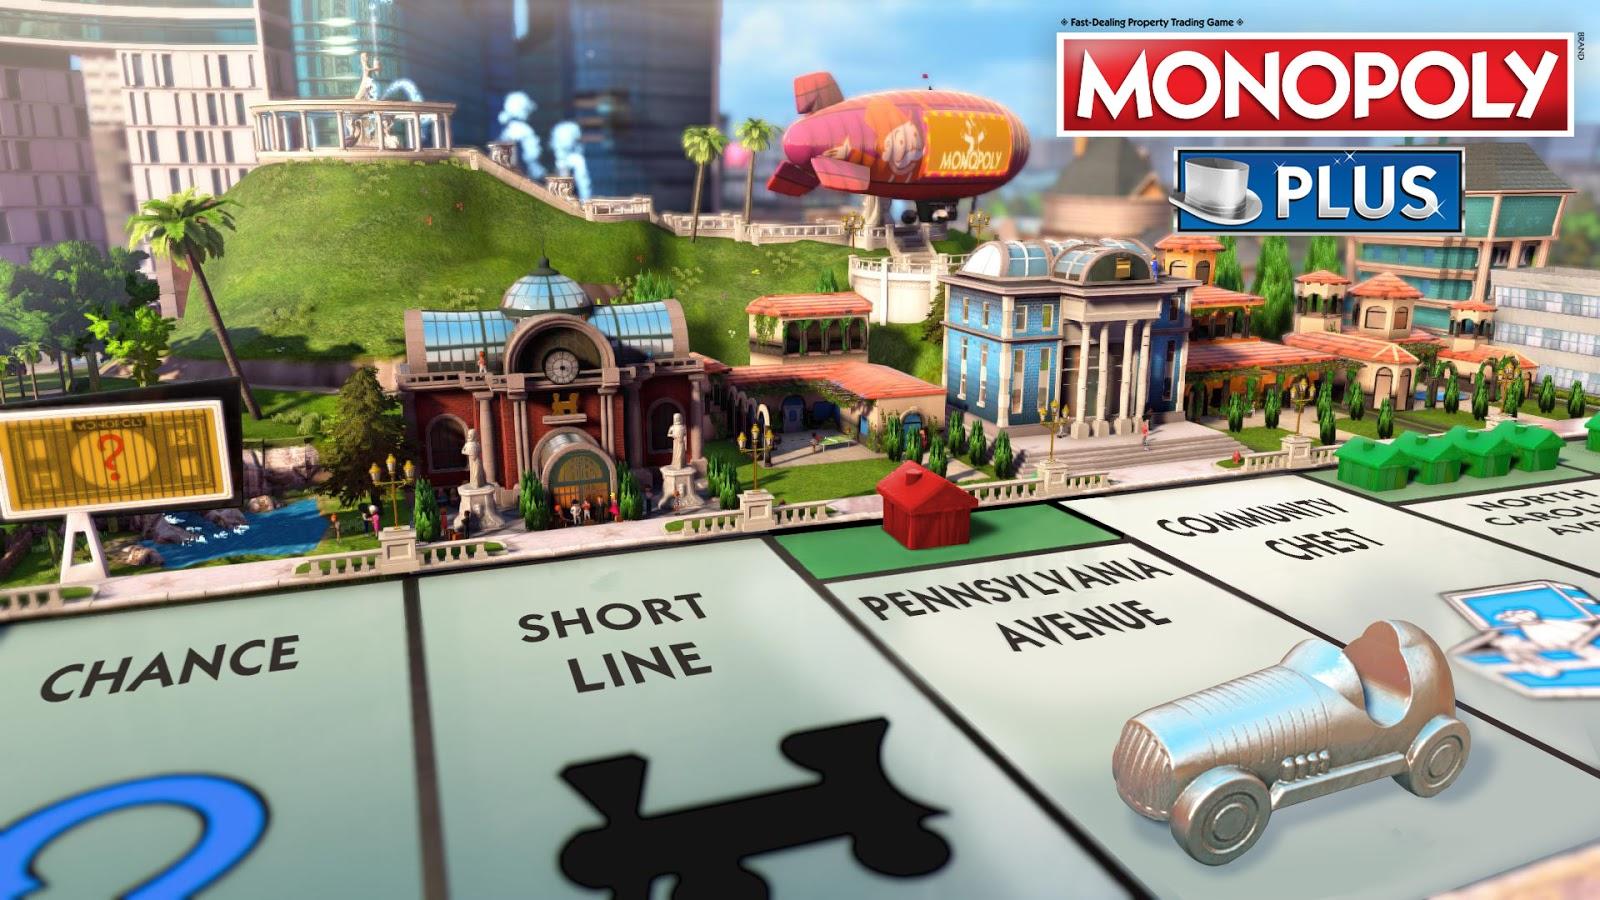 Monopoly Plus